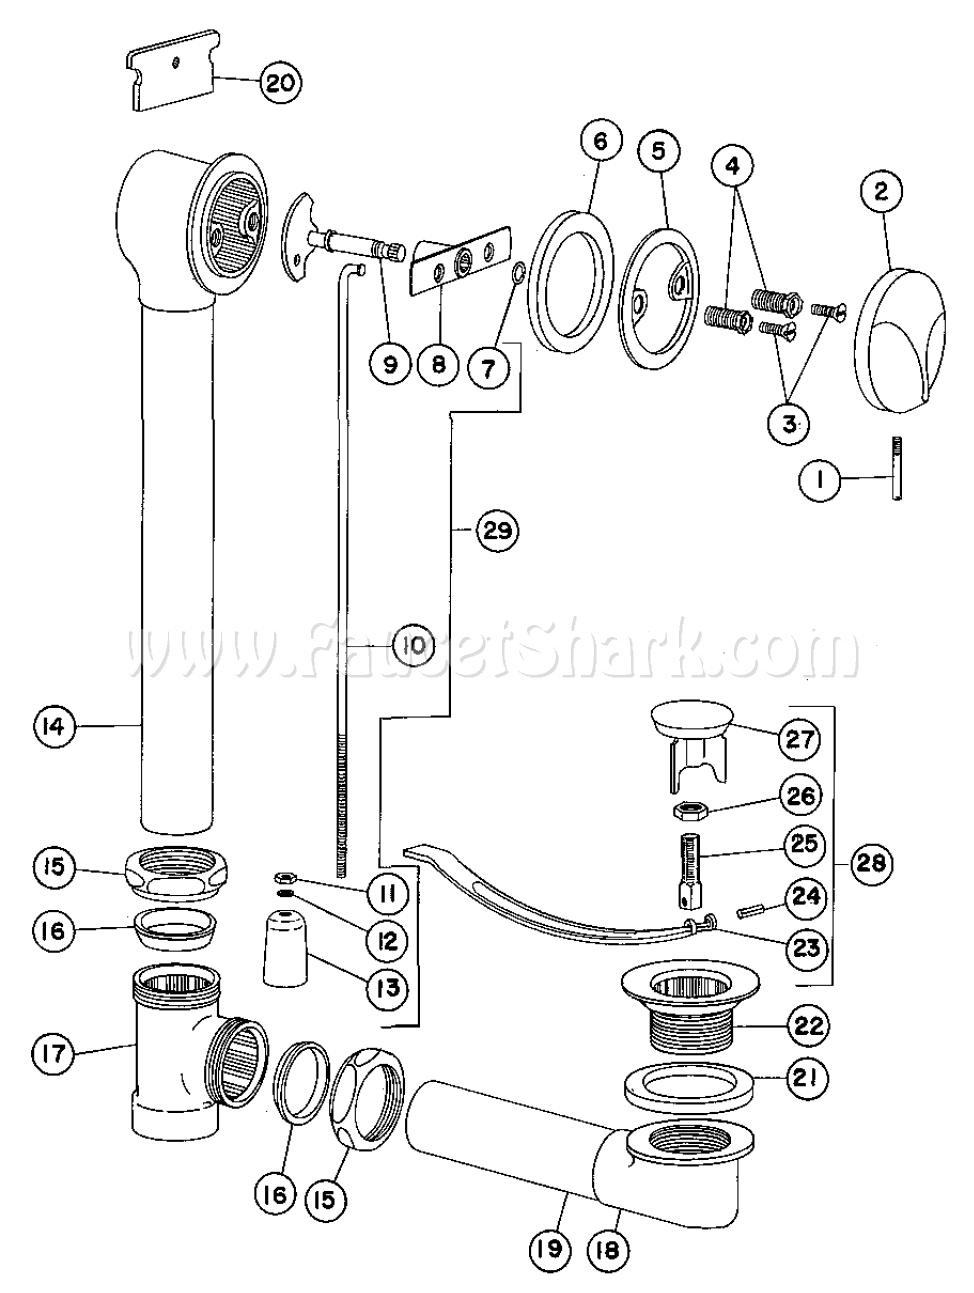 Crane 8 1505 Criterion Bath Waste Fitting Parts